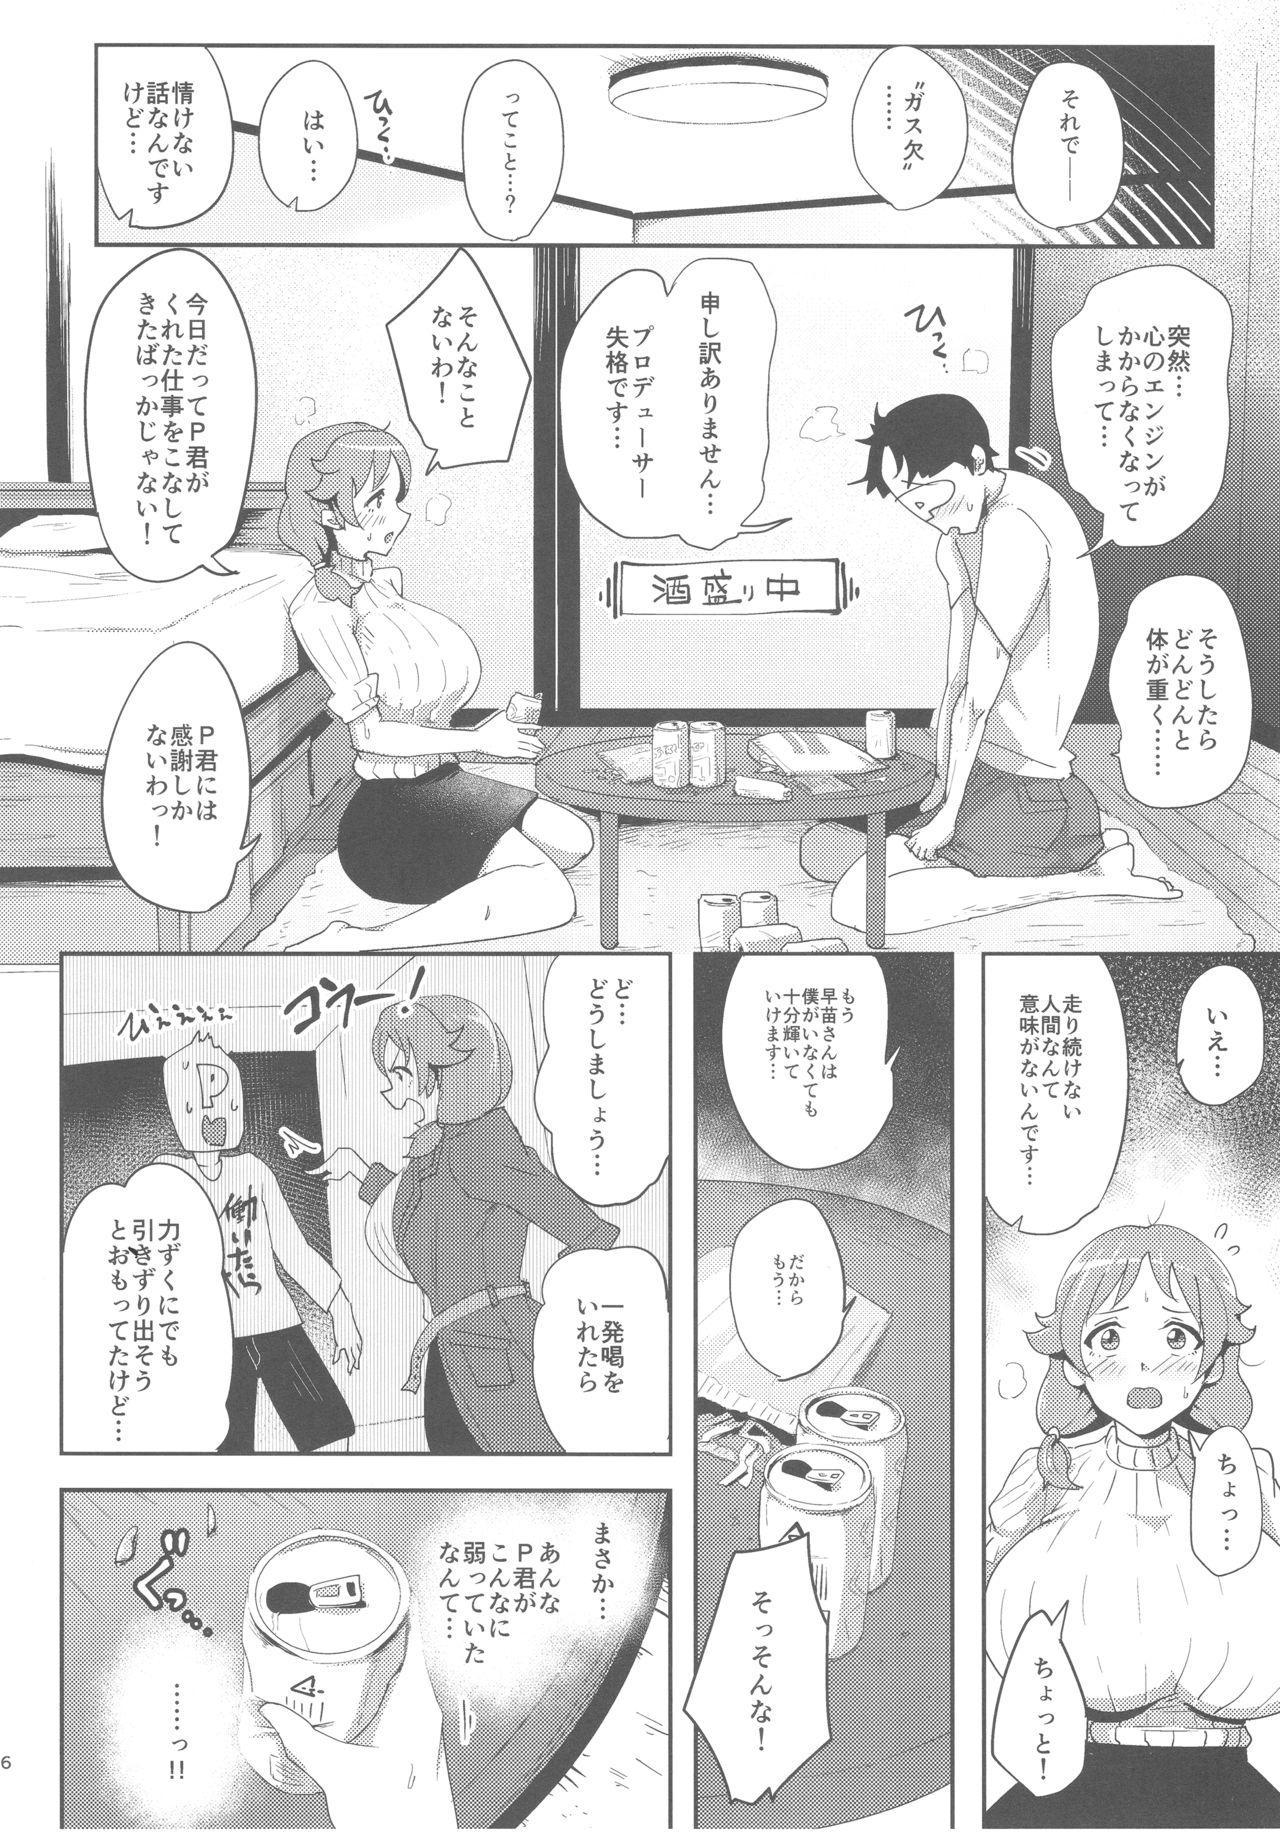 Sanae-san ni Genki ni Shitemorau Hon 4